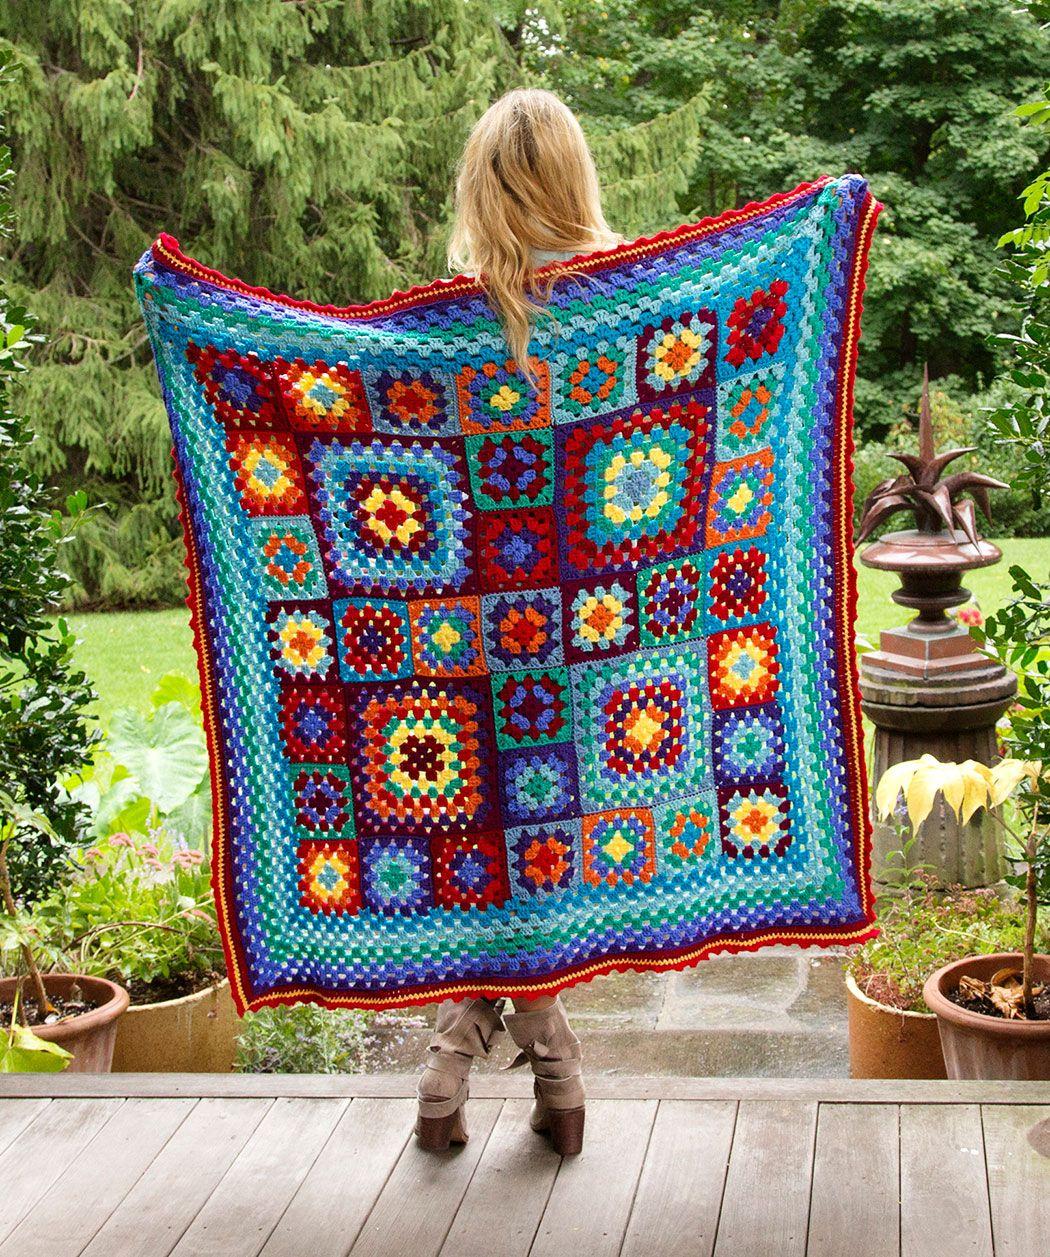 Make a Blanket Statement Crochet Pattern   Crochet patterns, Crochet,  Crochet knit blanket